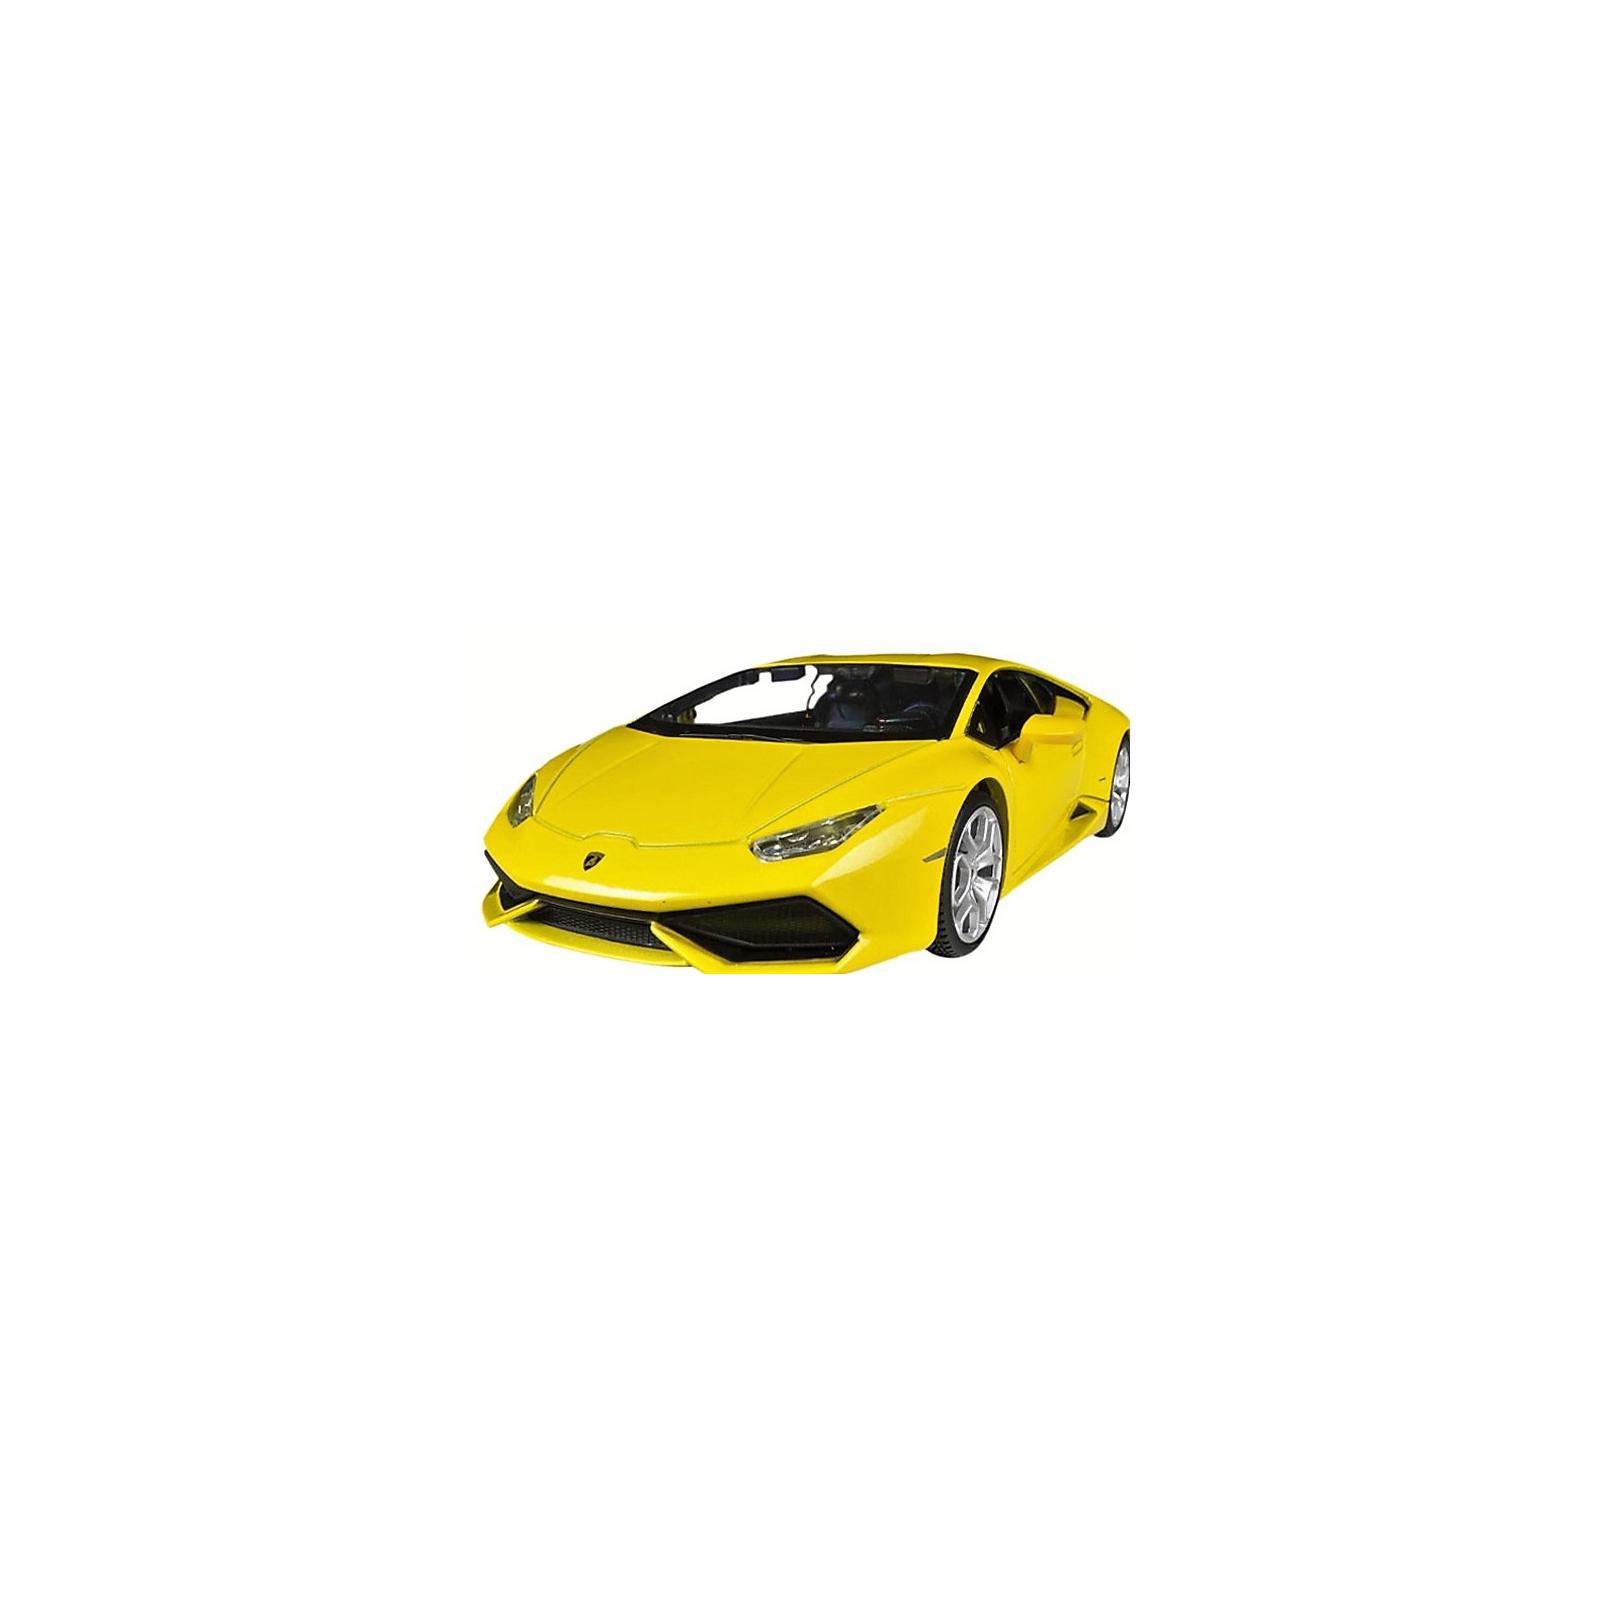 Машина Maisto Lamborghini Huracan LP 610-4 (1:24) желтый (31509 yellow) изображение 4